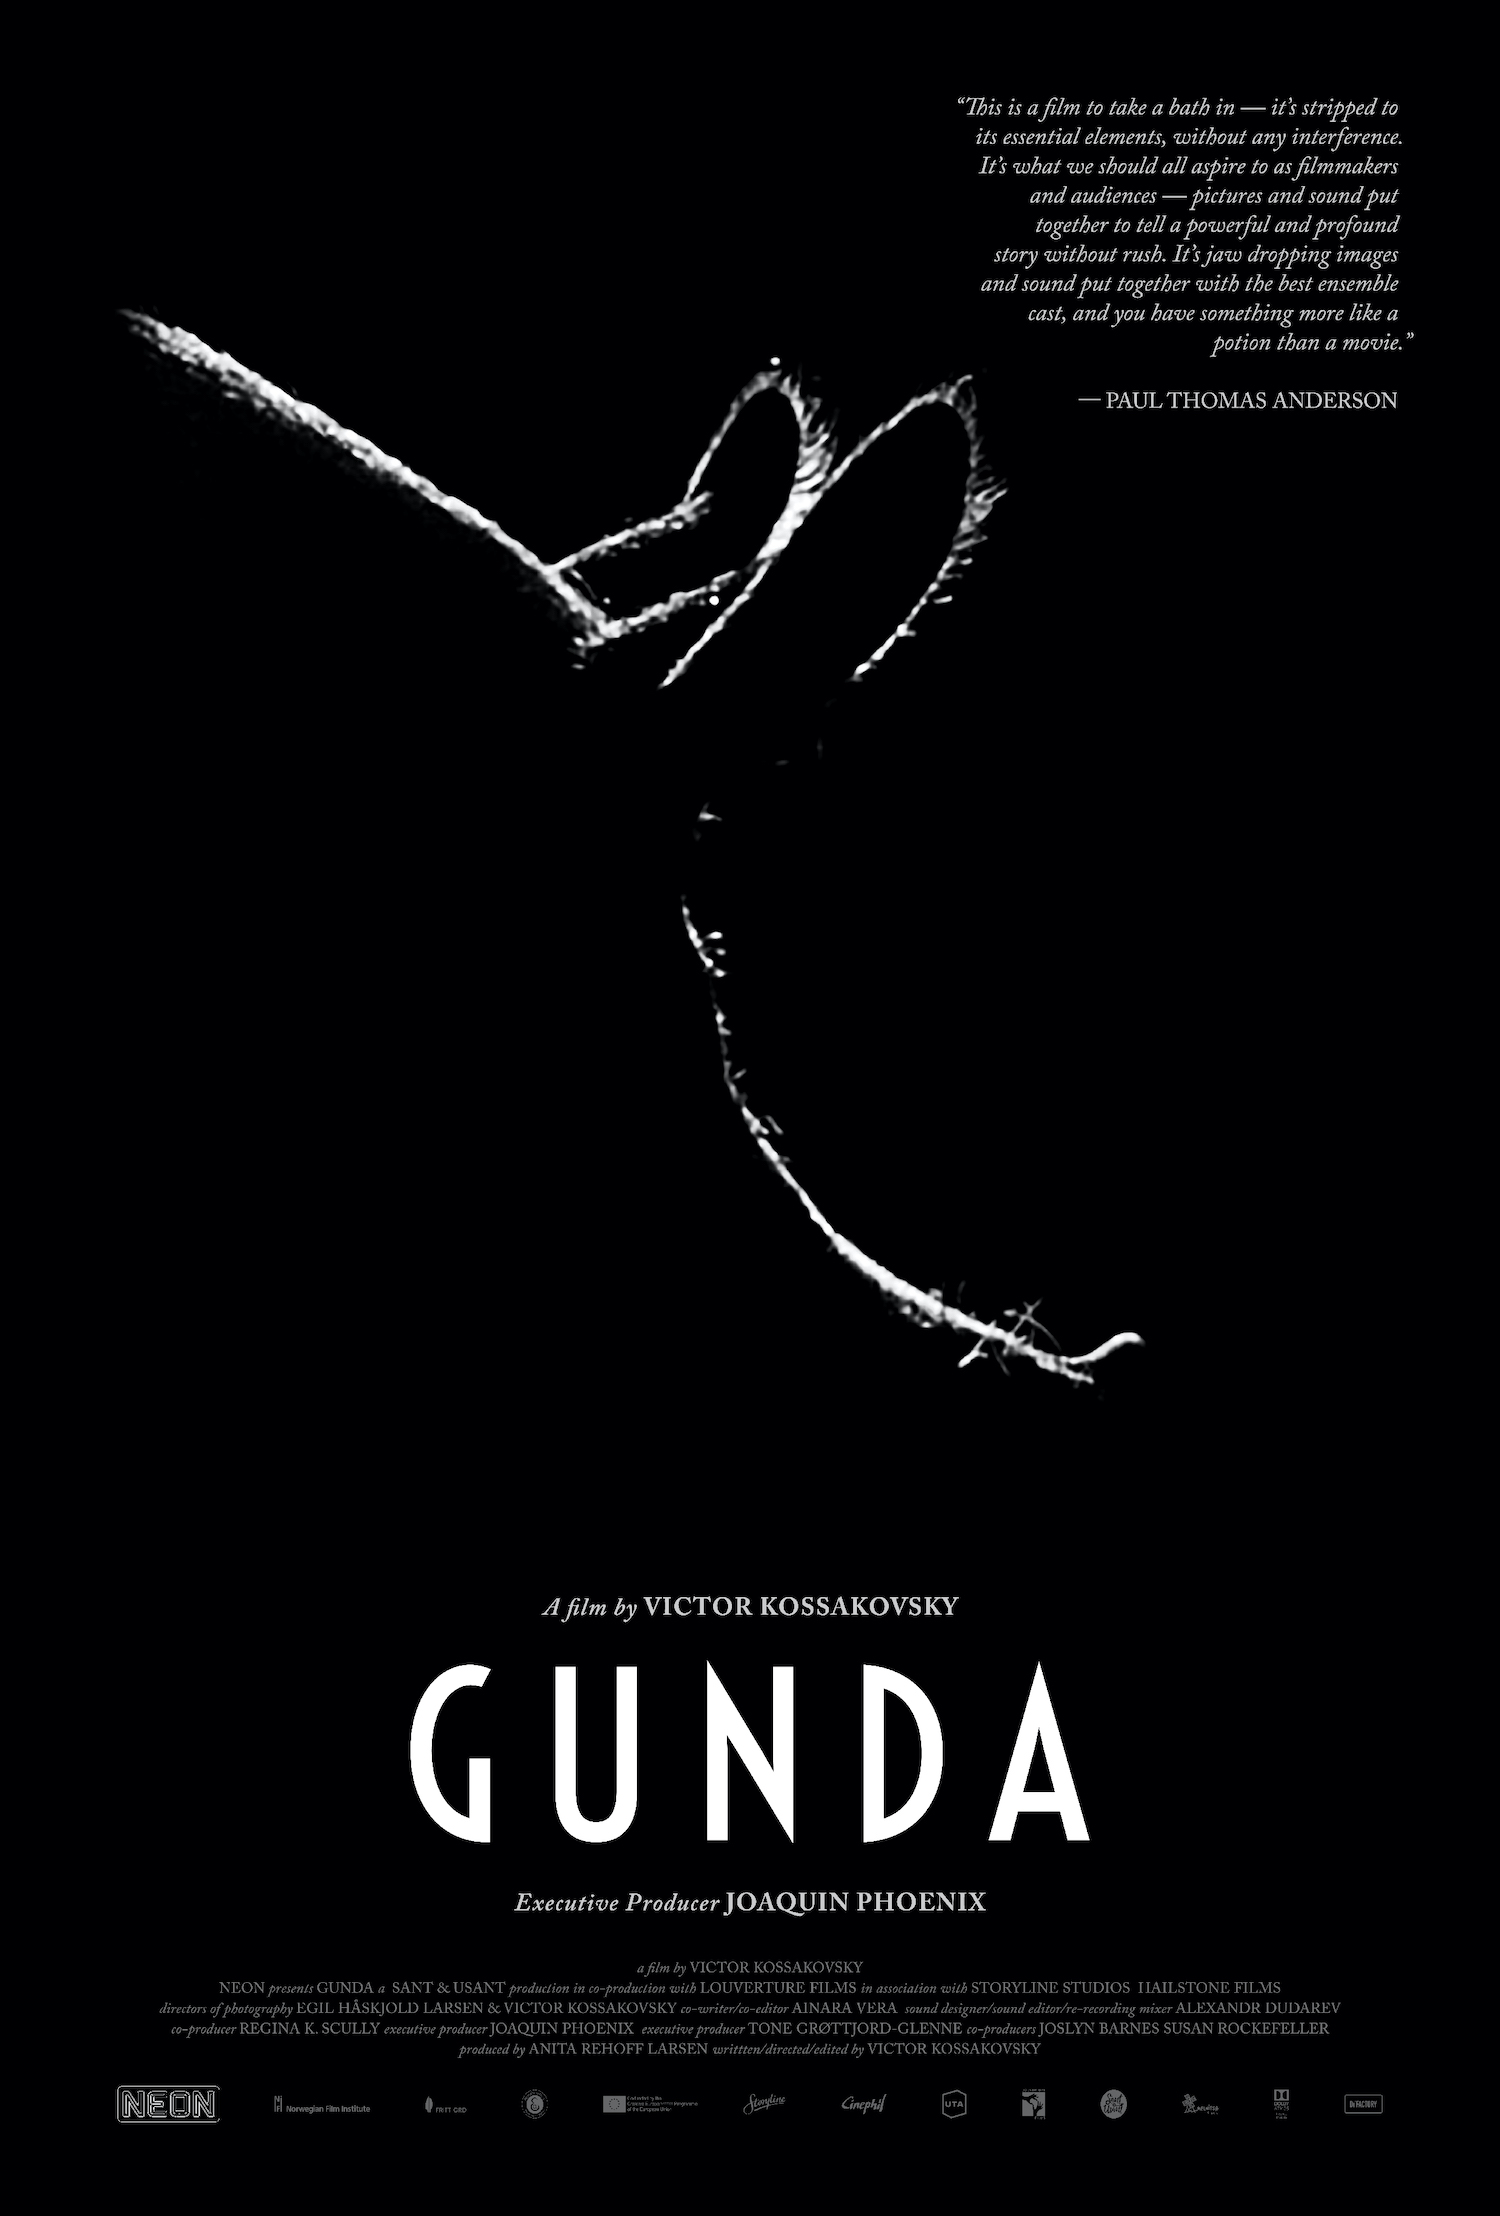 Gunda: A Virtual Conversation with the Filmmaker Victor Kossakovsky